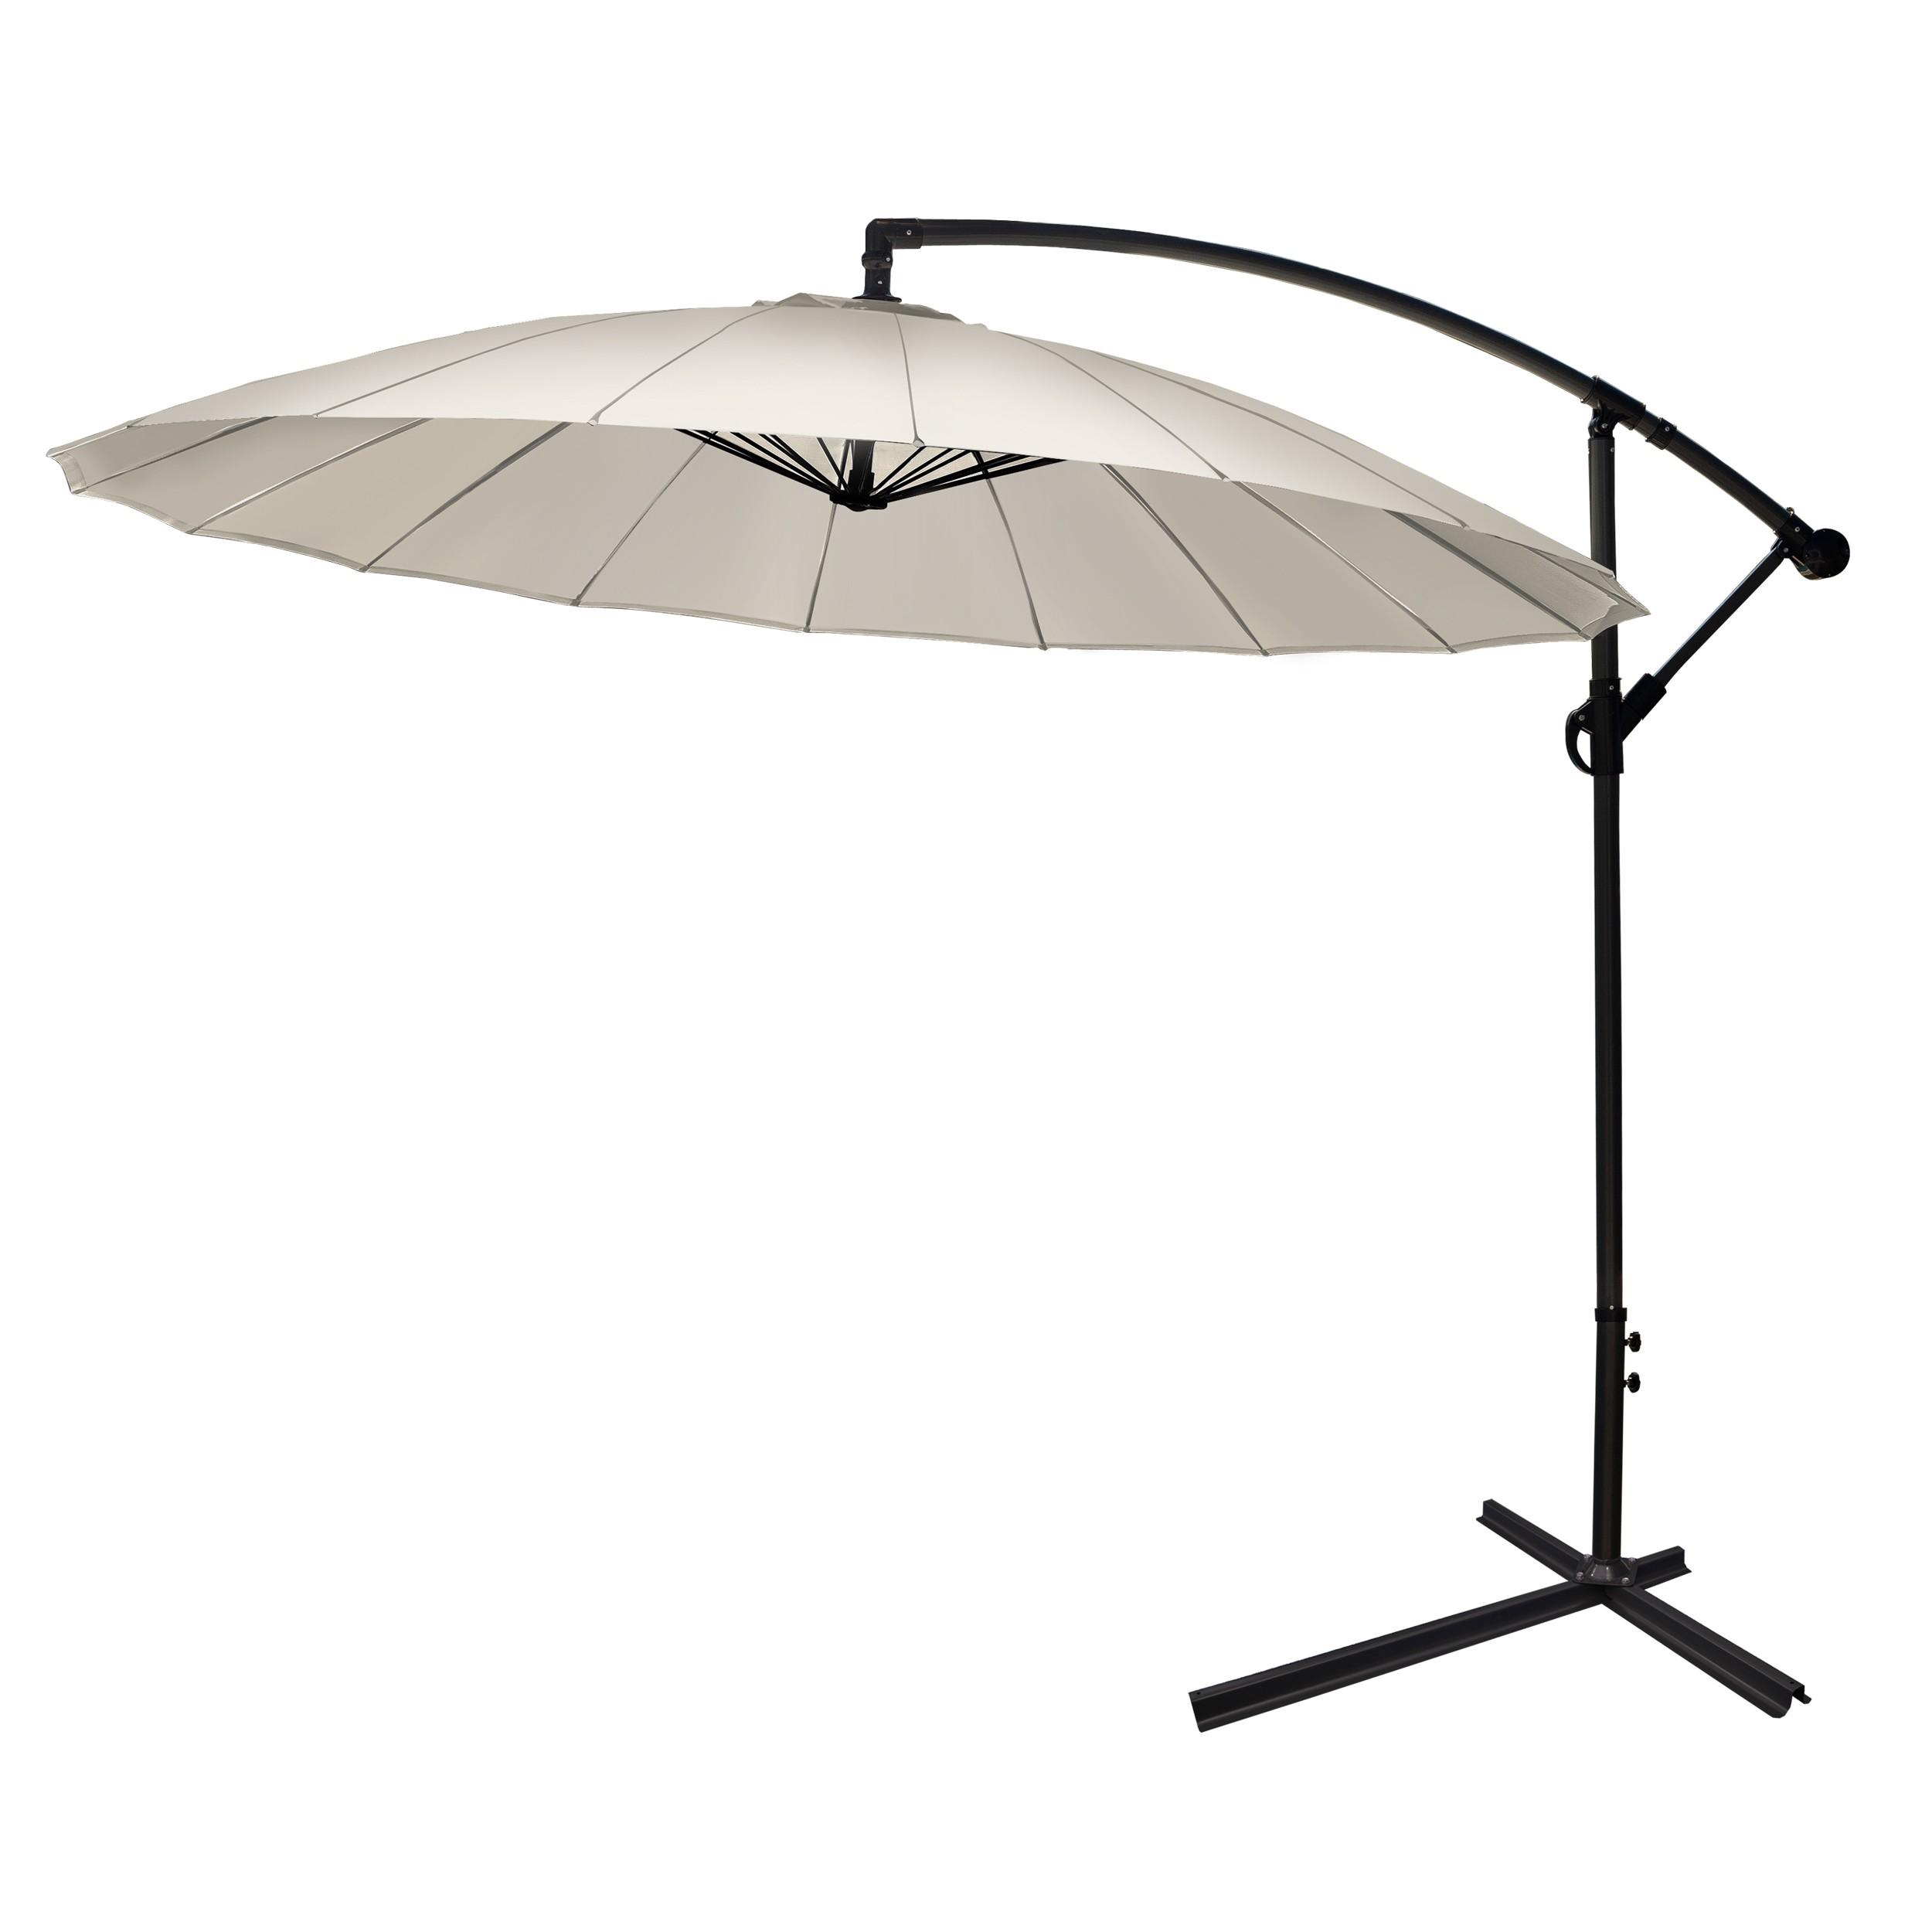 parasol d port achetez nos parasols d port s design prix d 39 usine rvdd co. Black Bedroom Furniture Sets. Home Design Ideas